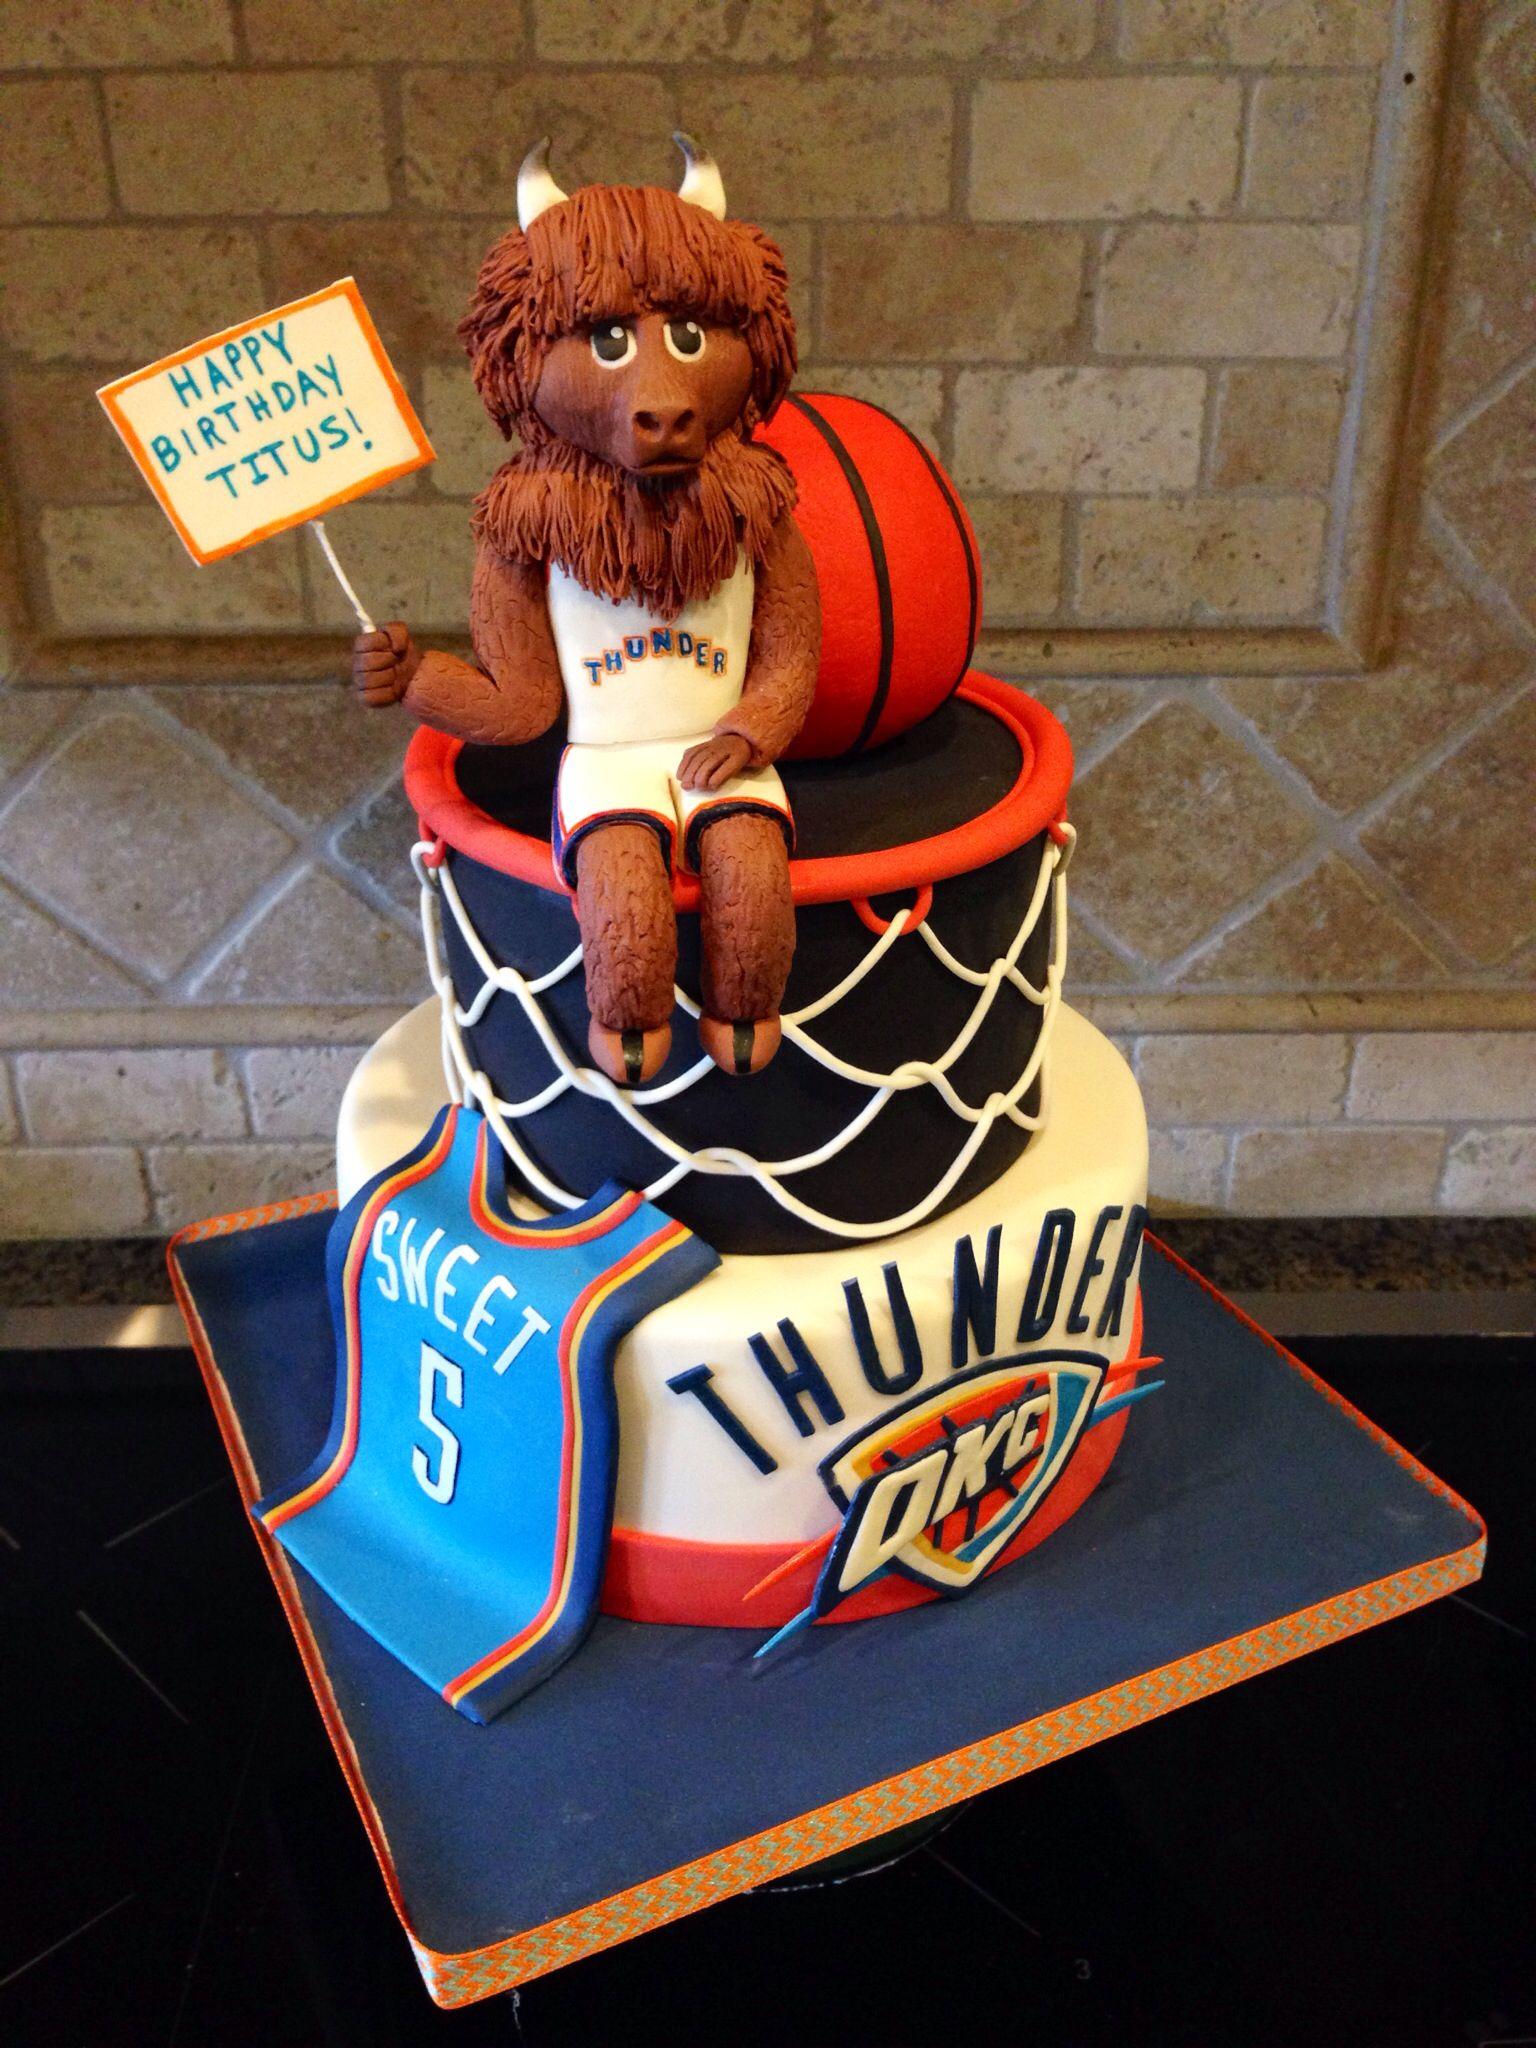 Pleasant Okc Thunder Cake With Fondant Rumble Figure With Images Funny Birthday Cards Online Inifofree Goldxyz